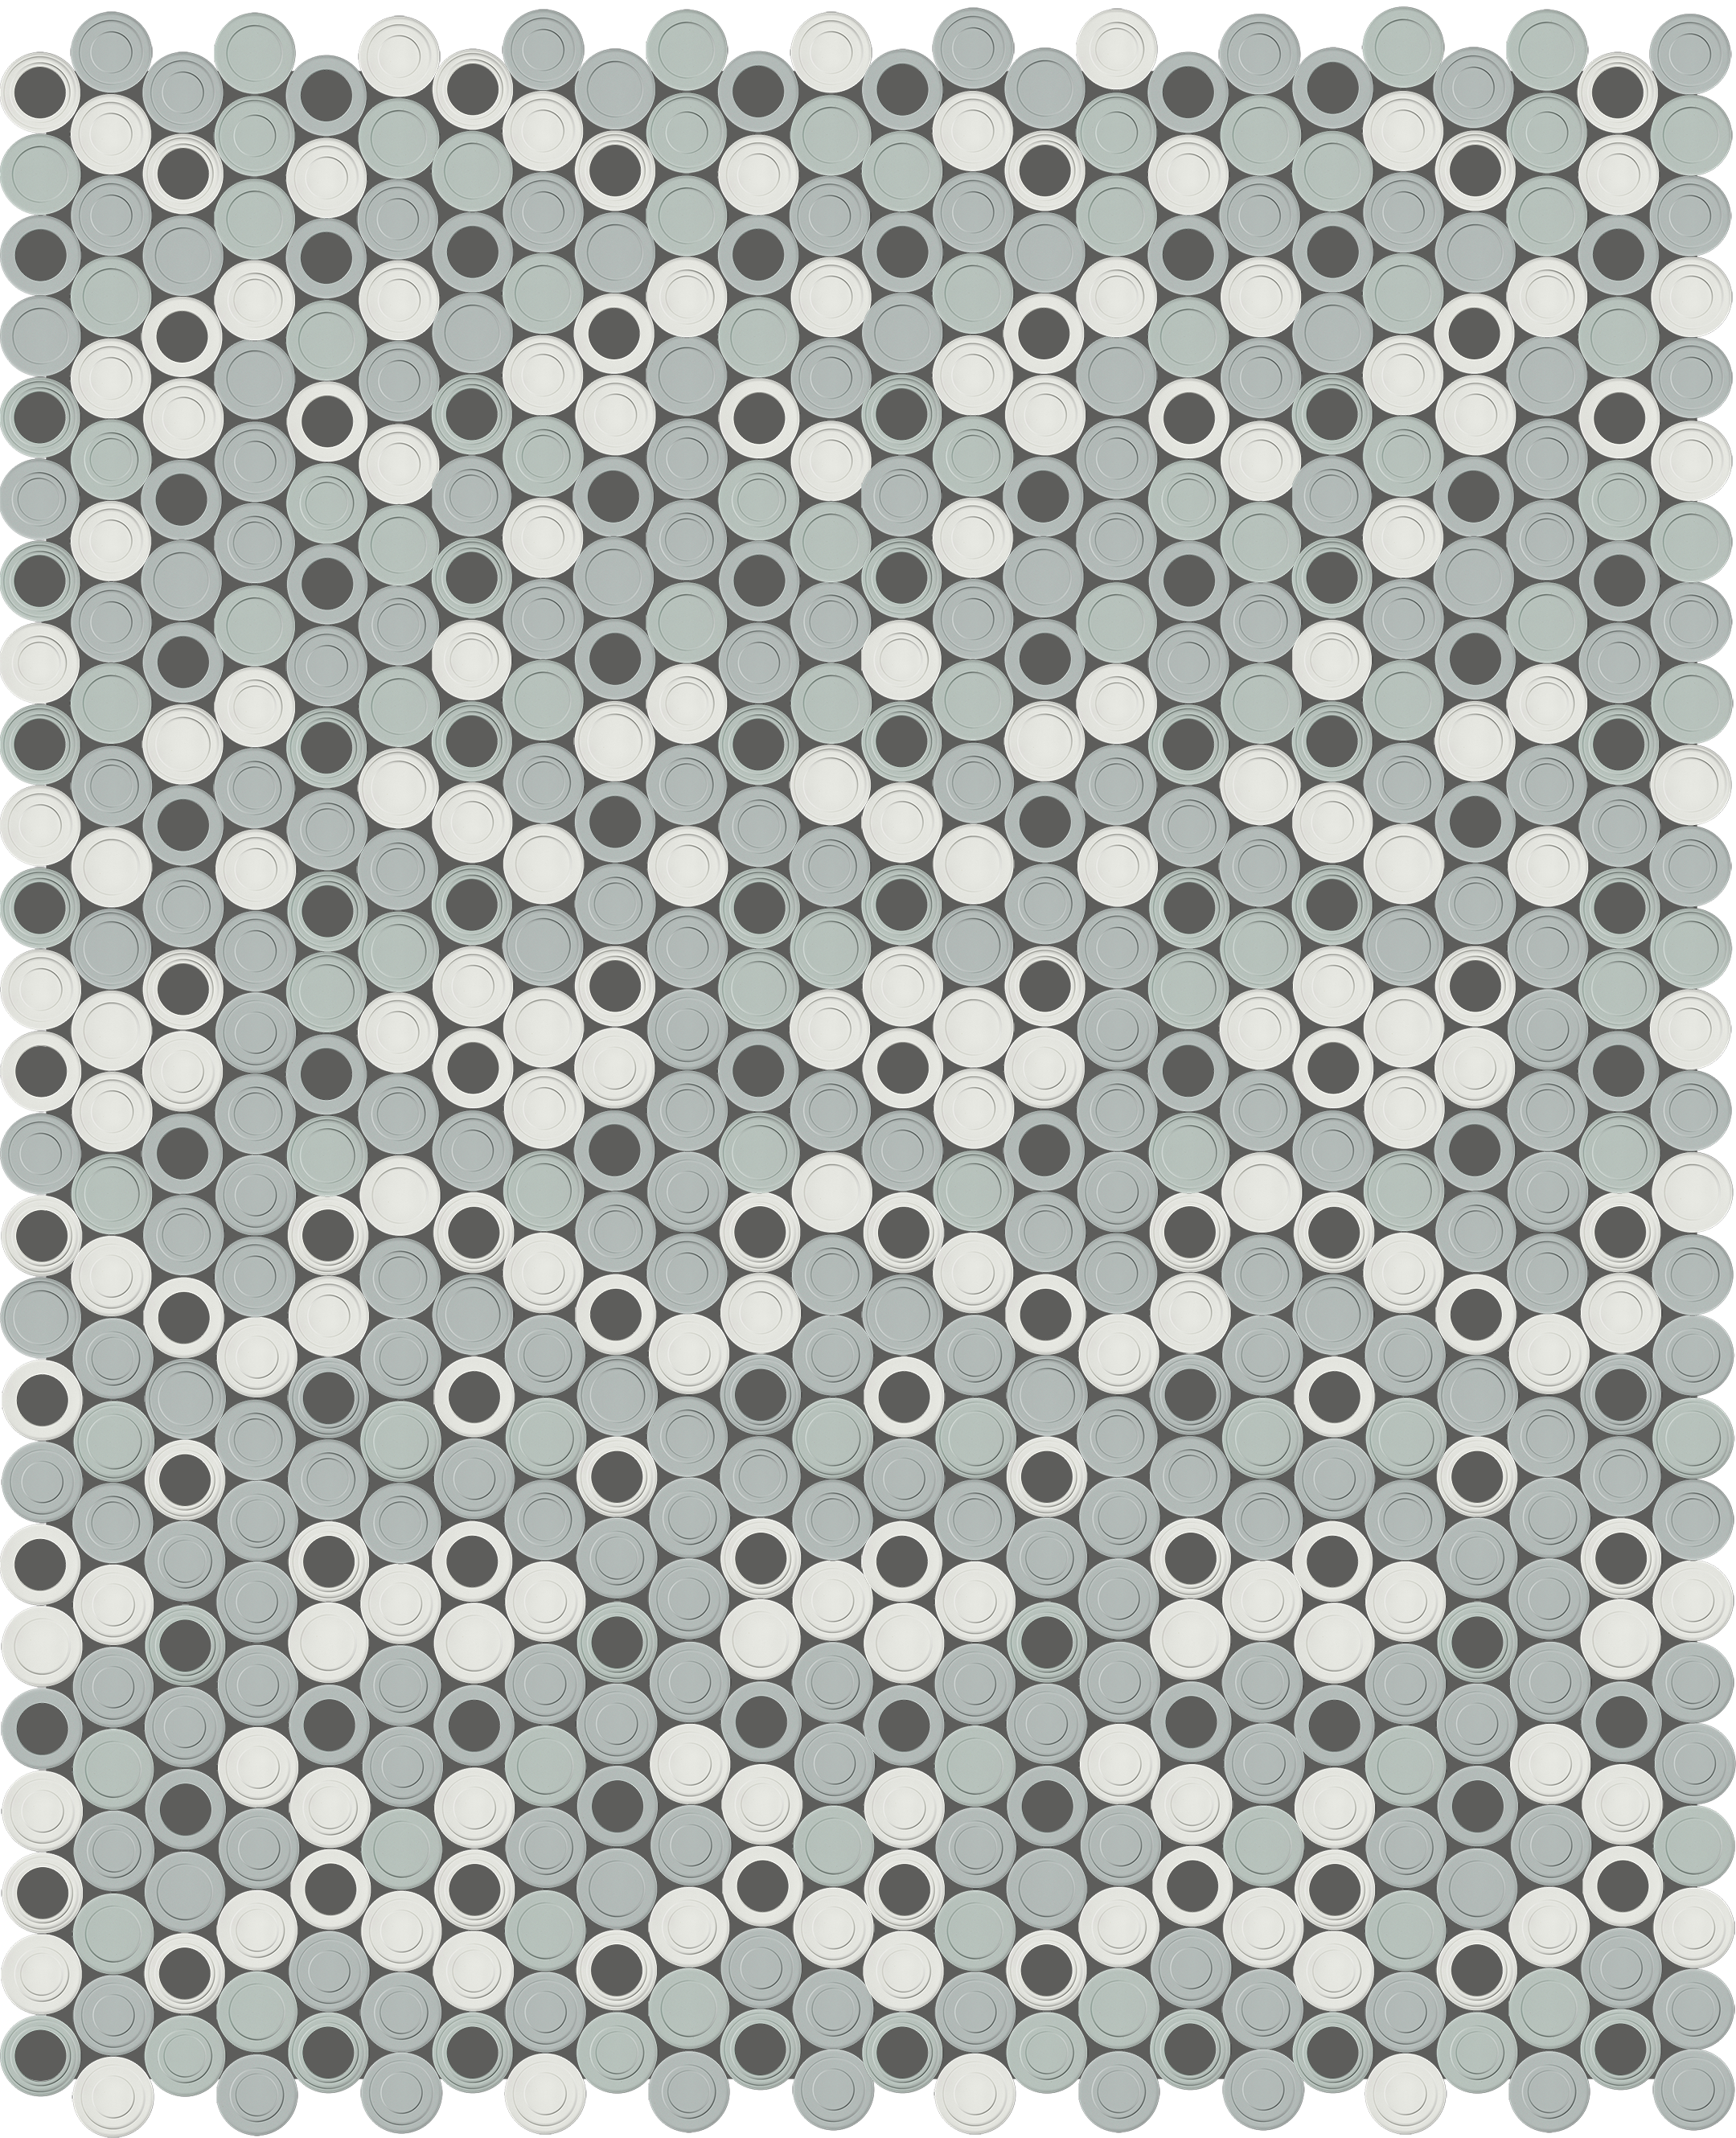 R1-R6 : Pattern B